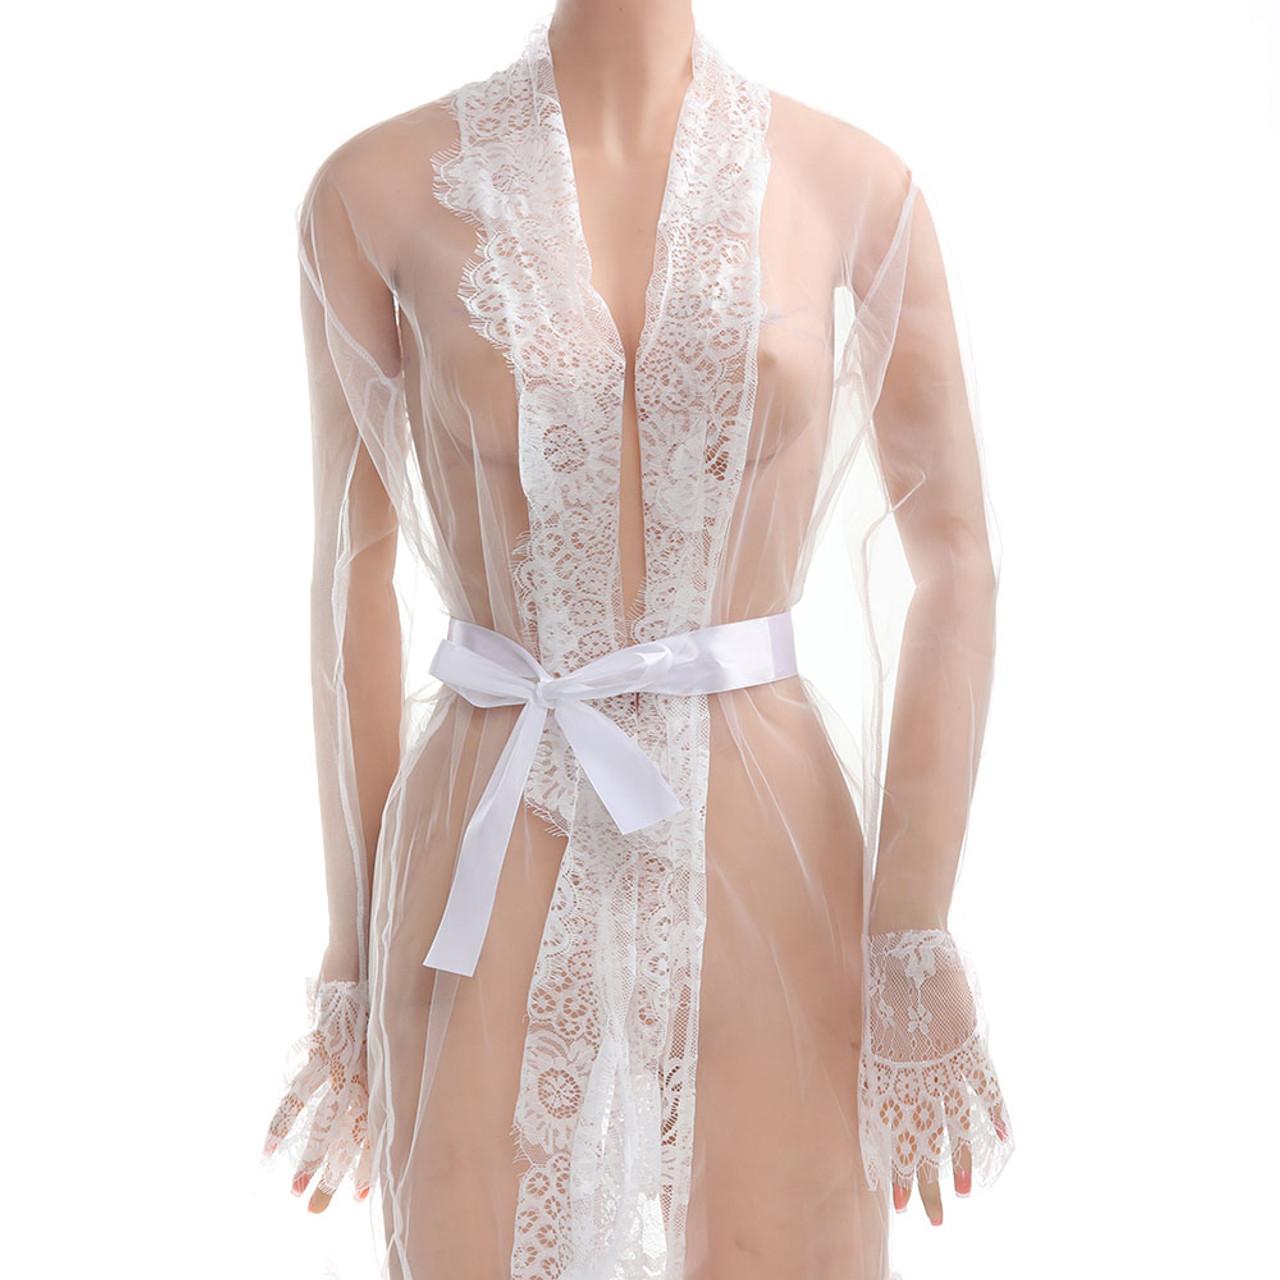 e395be2e997 ... 2017 Newest Fashion Women Sexy Lace Robe Dress Breathable Lace G-string  Dress Bathrobes Pajamas ...